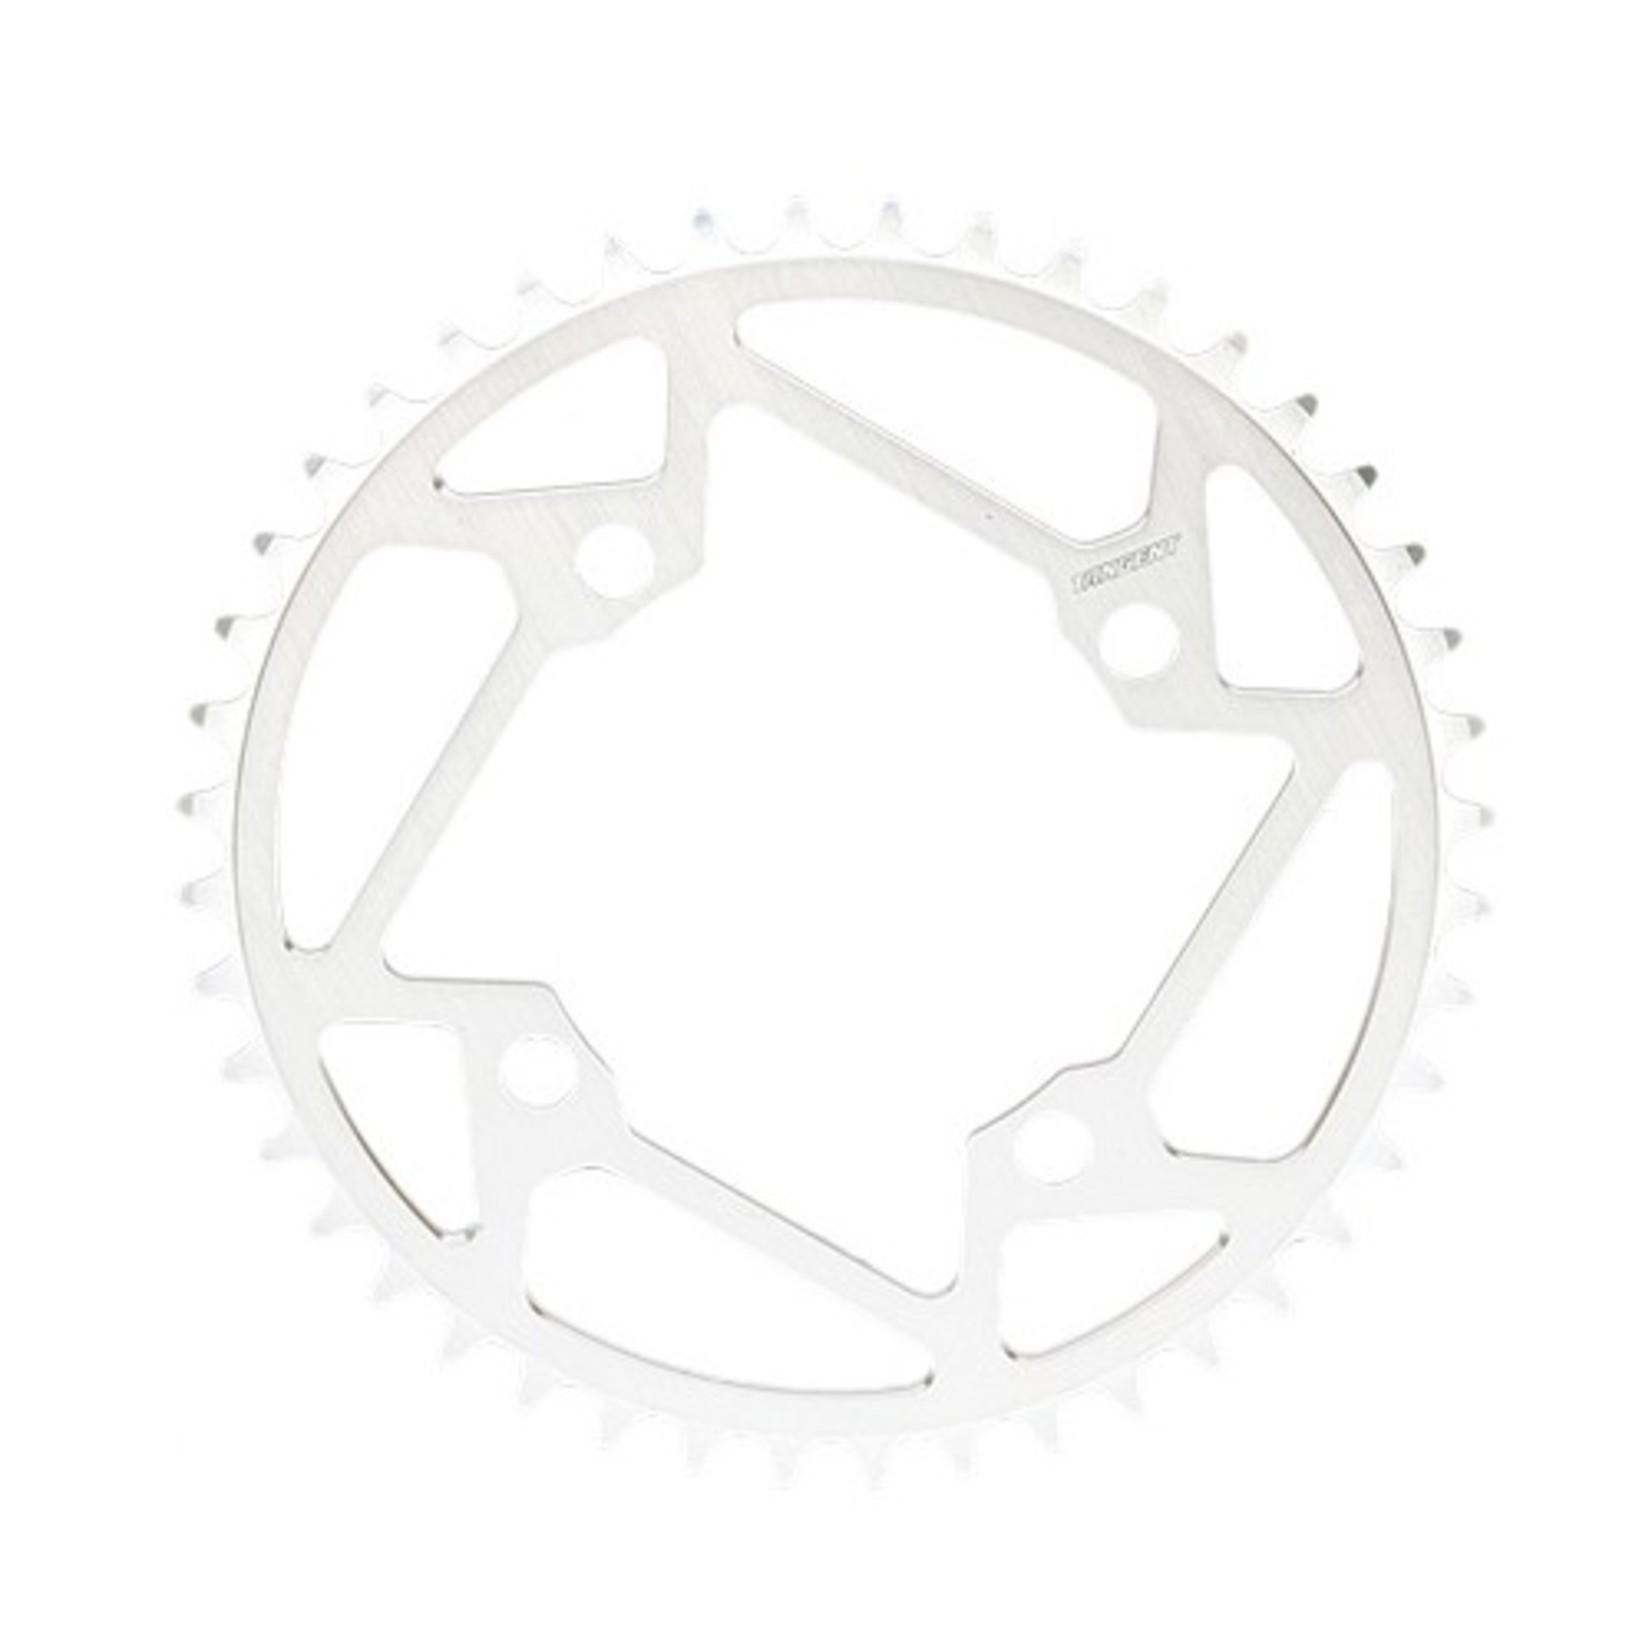 Tangent 4-Bolt Halo Chainring